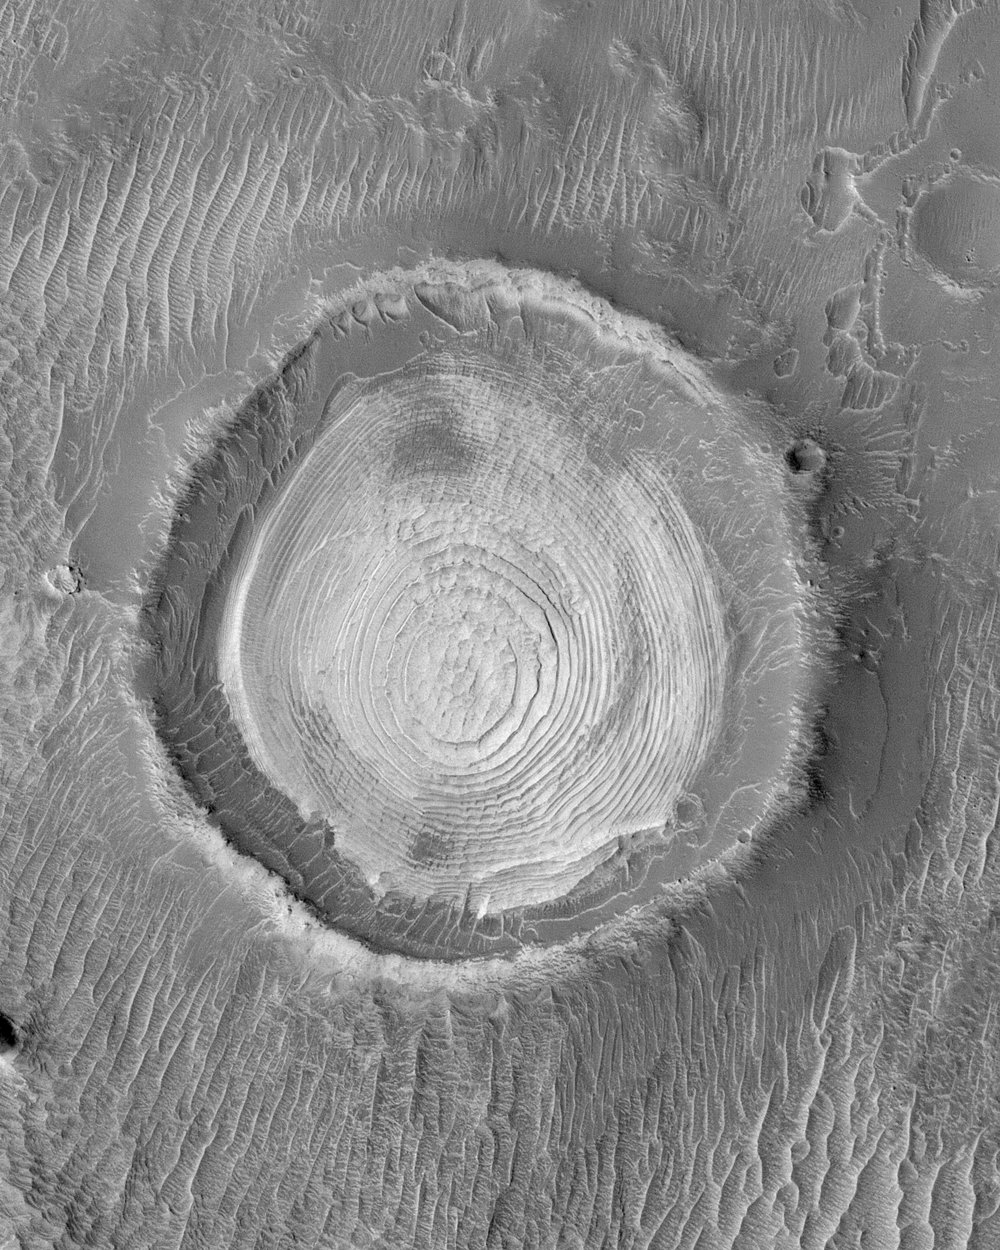 schiaparelli_basin_crater (1).jpg